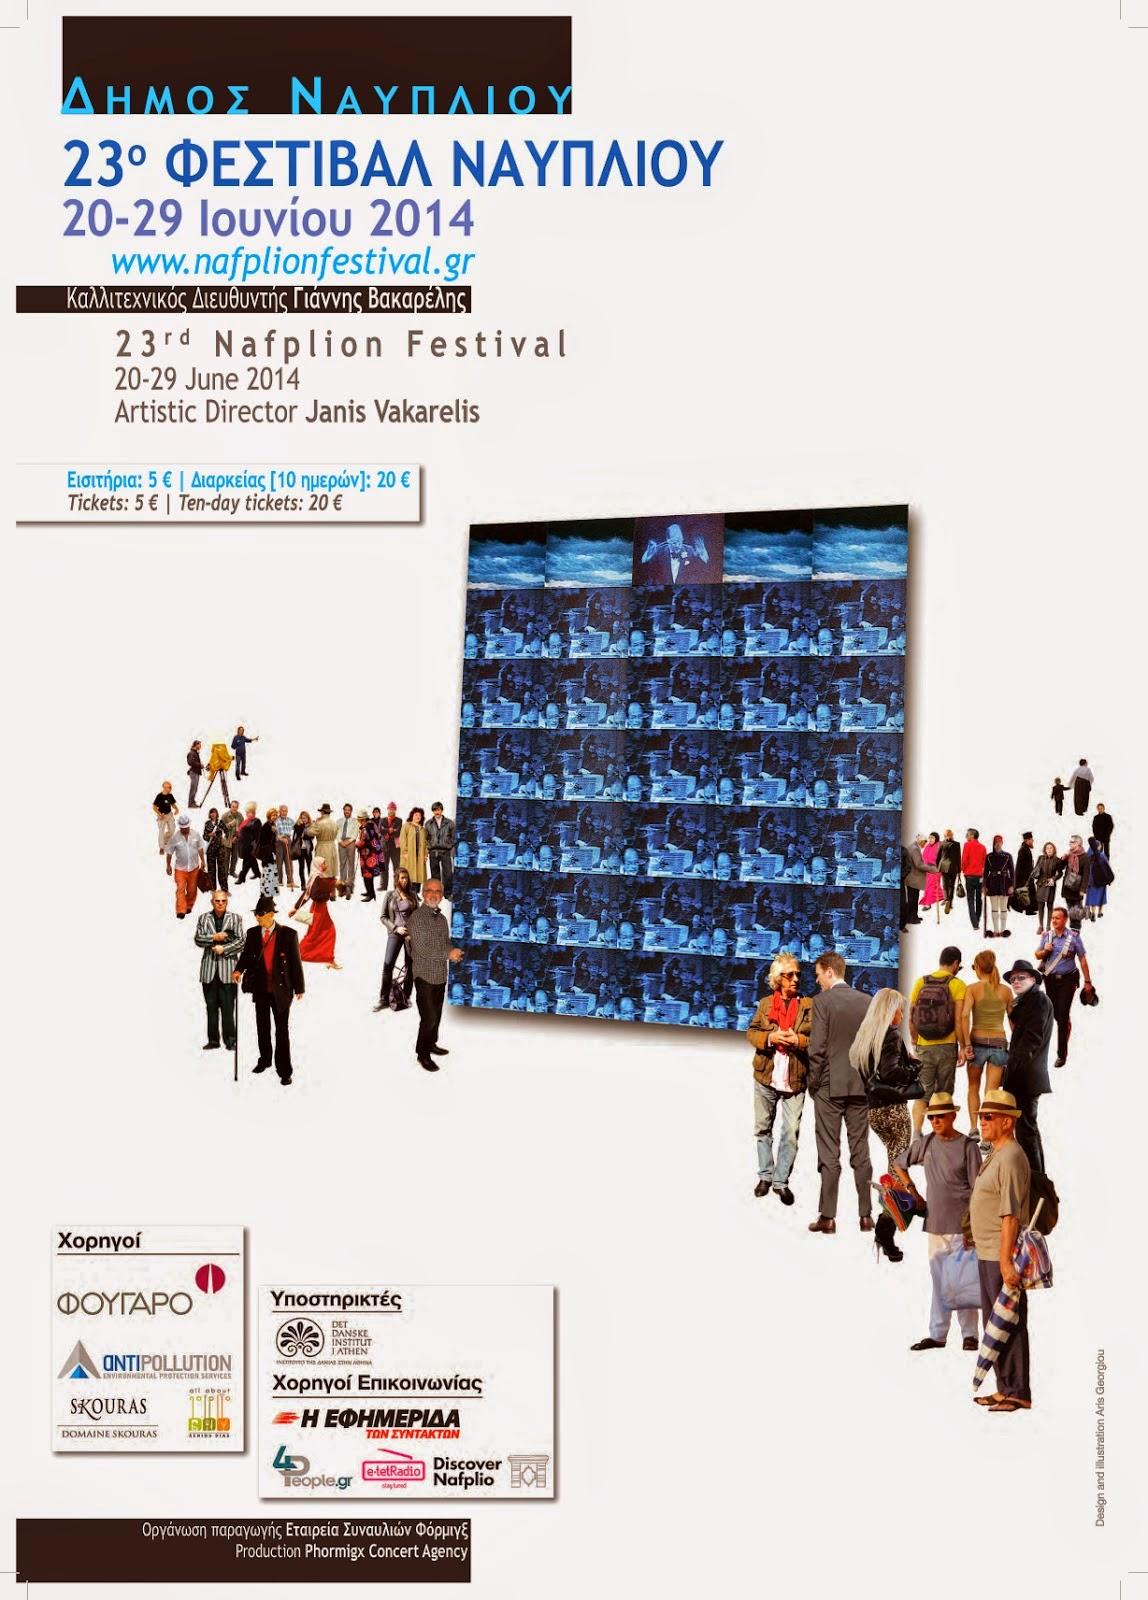 afisa_23o festival nafpliou_A3 (1)